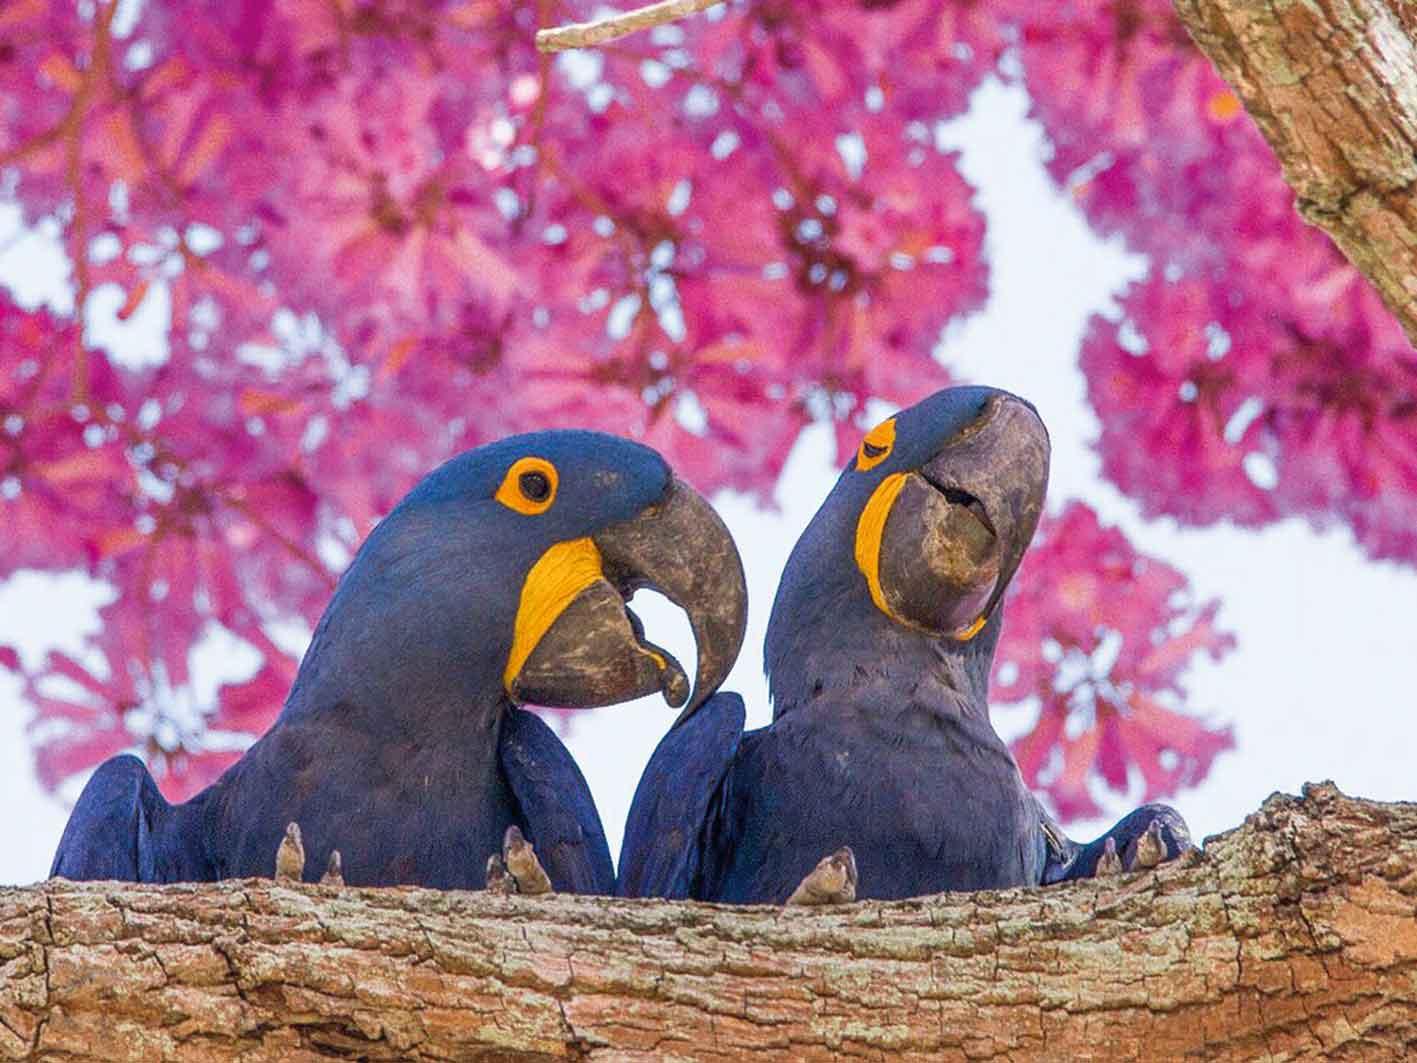 Blaue Aras, Pantanal, Brasilien Foto: Amaury Santos